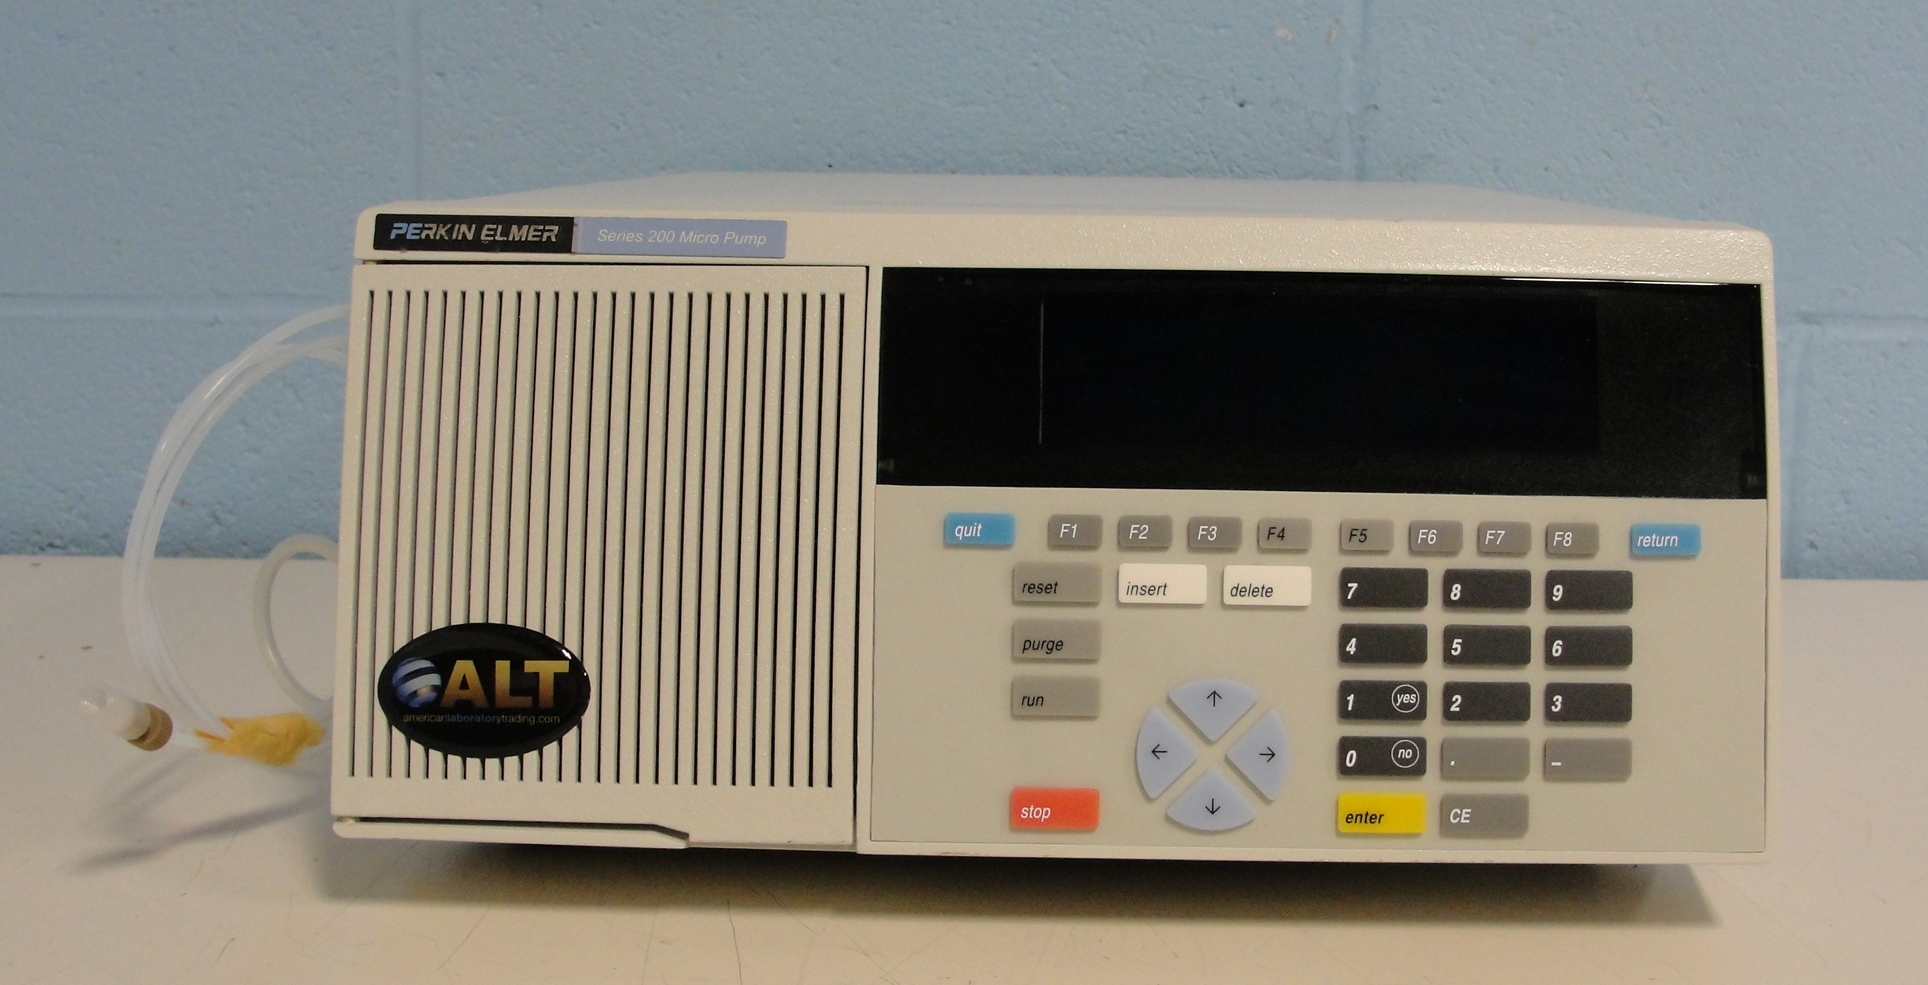 Perkin Elmer Series 200 Micro Pump Image